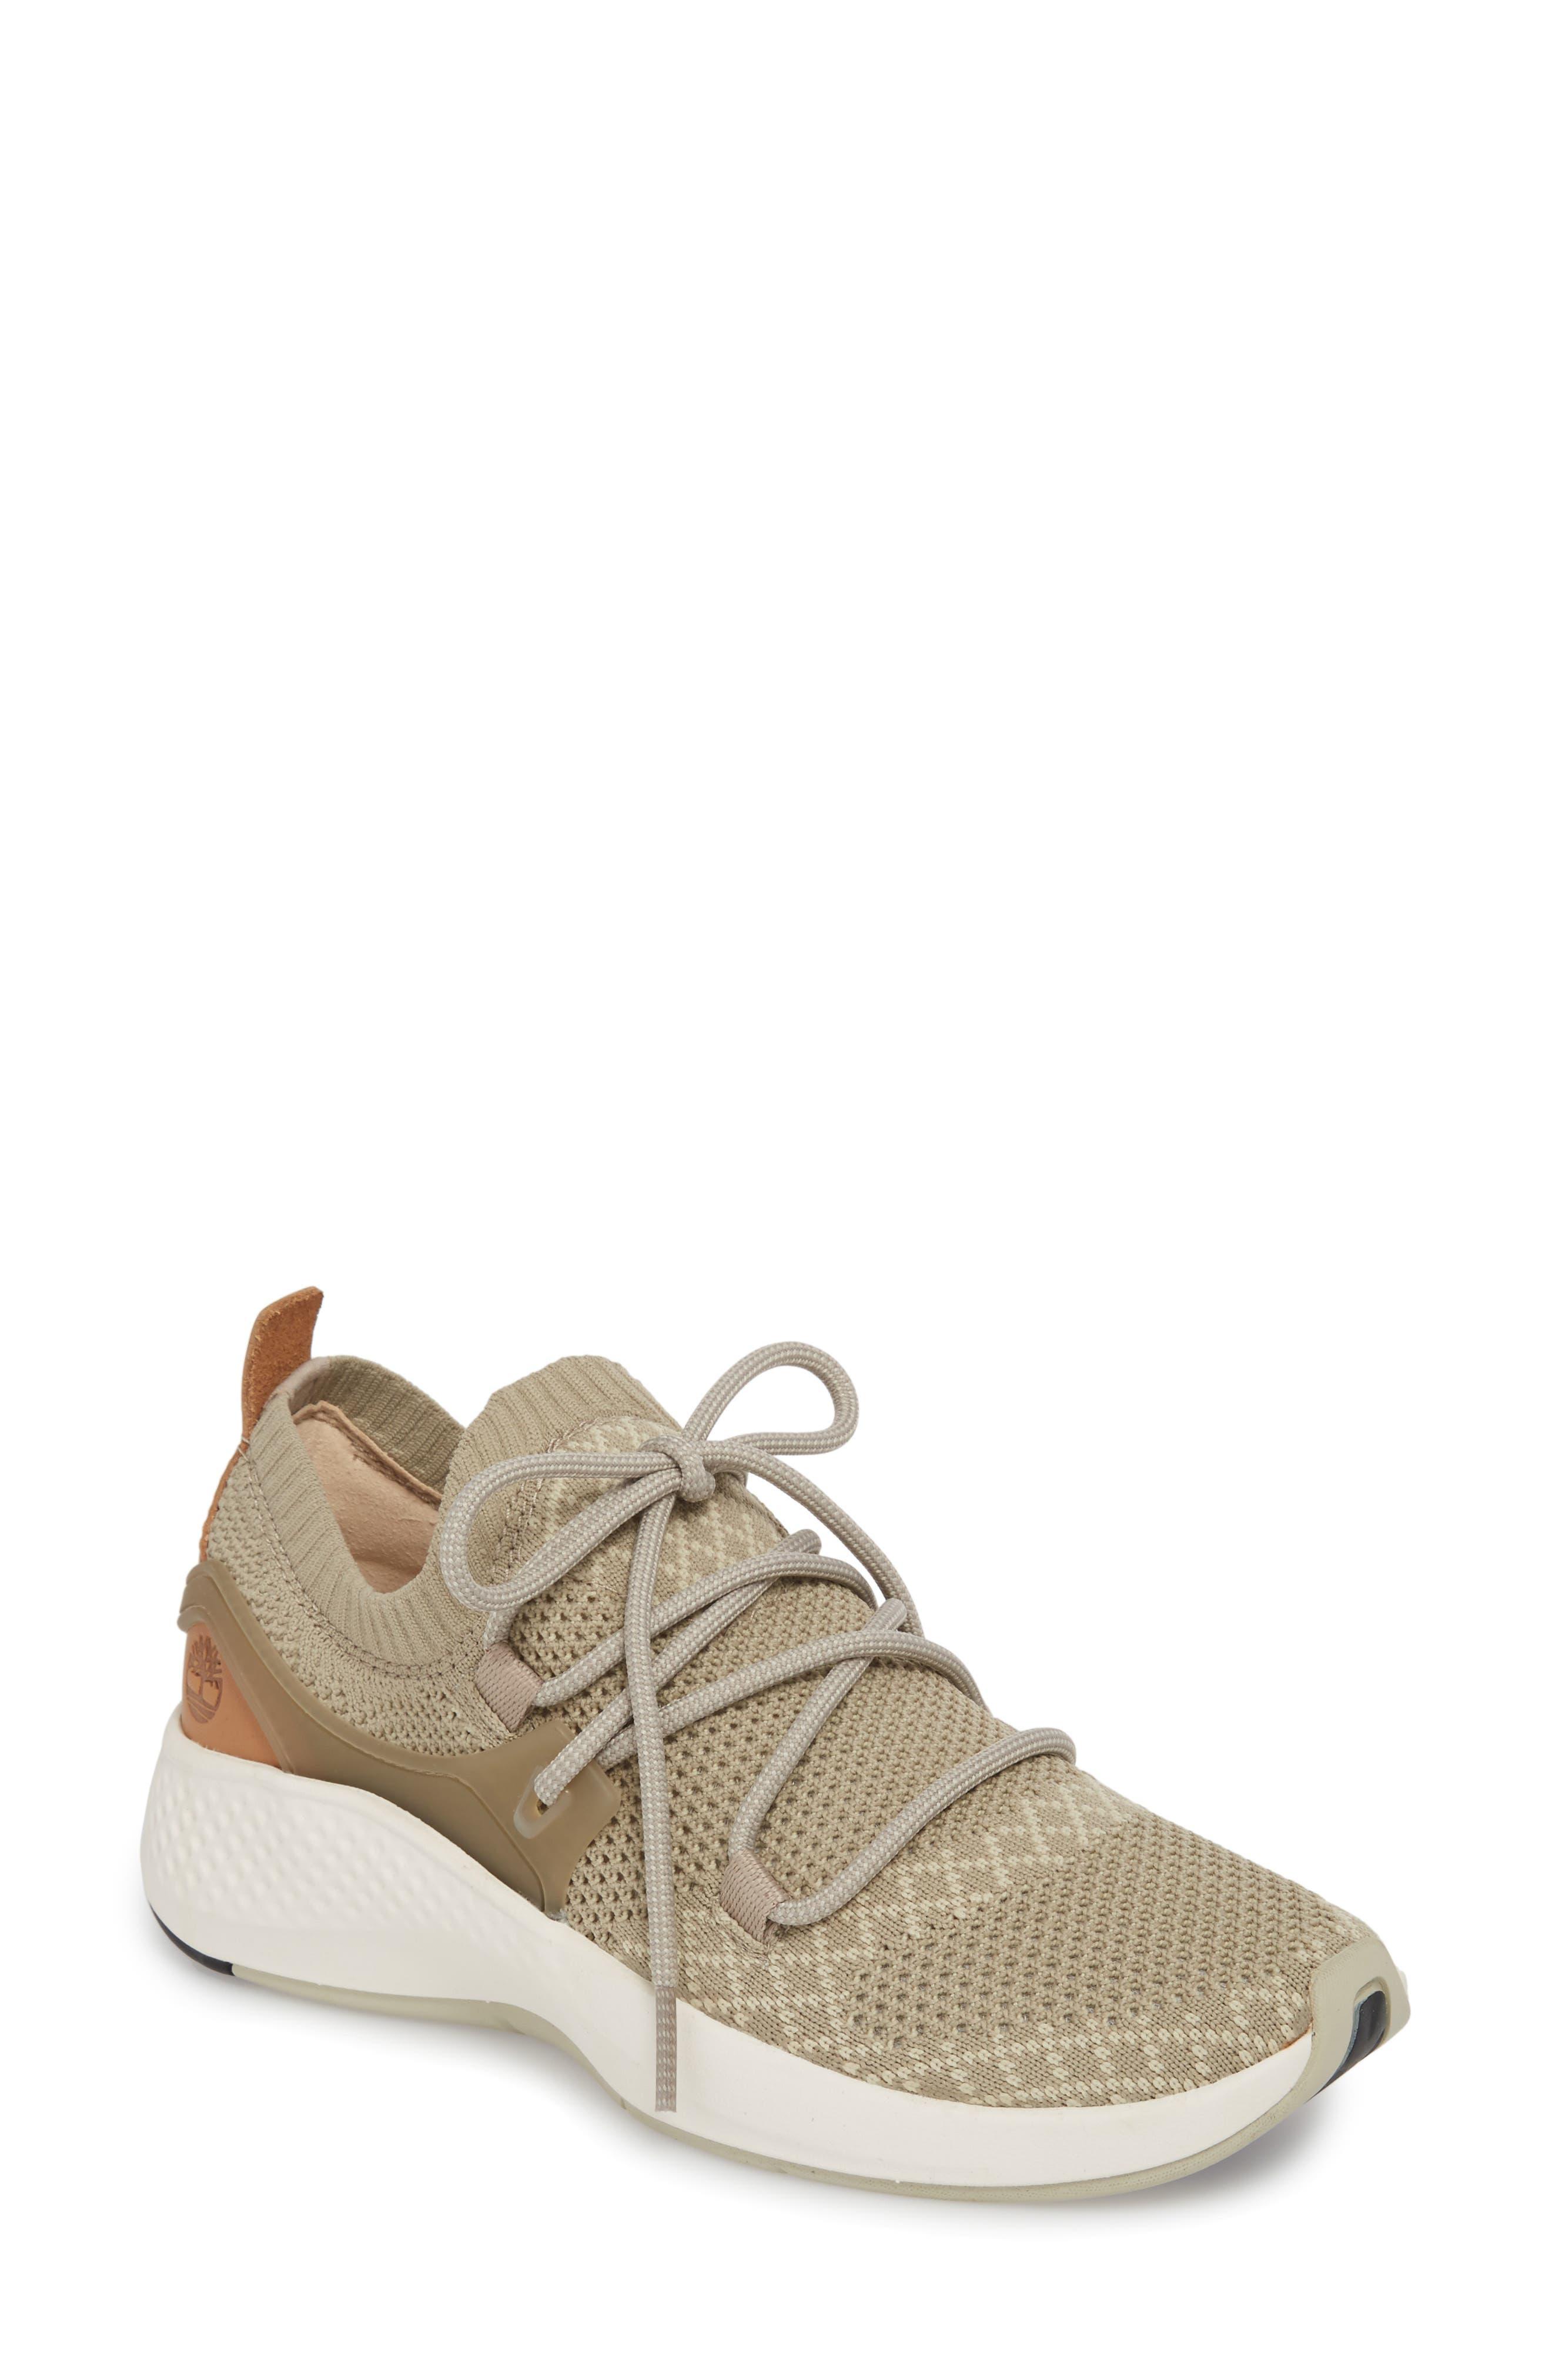 Timberland FlyRoam Go Knit Sneaker (Women)